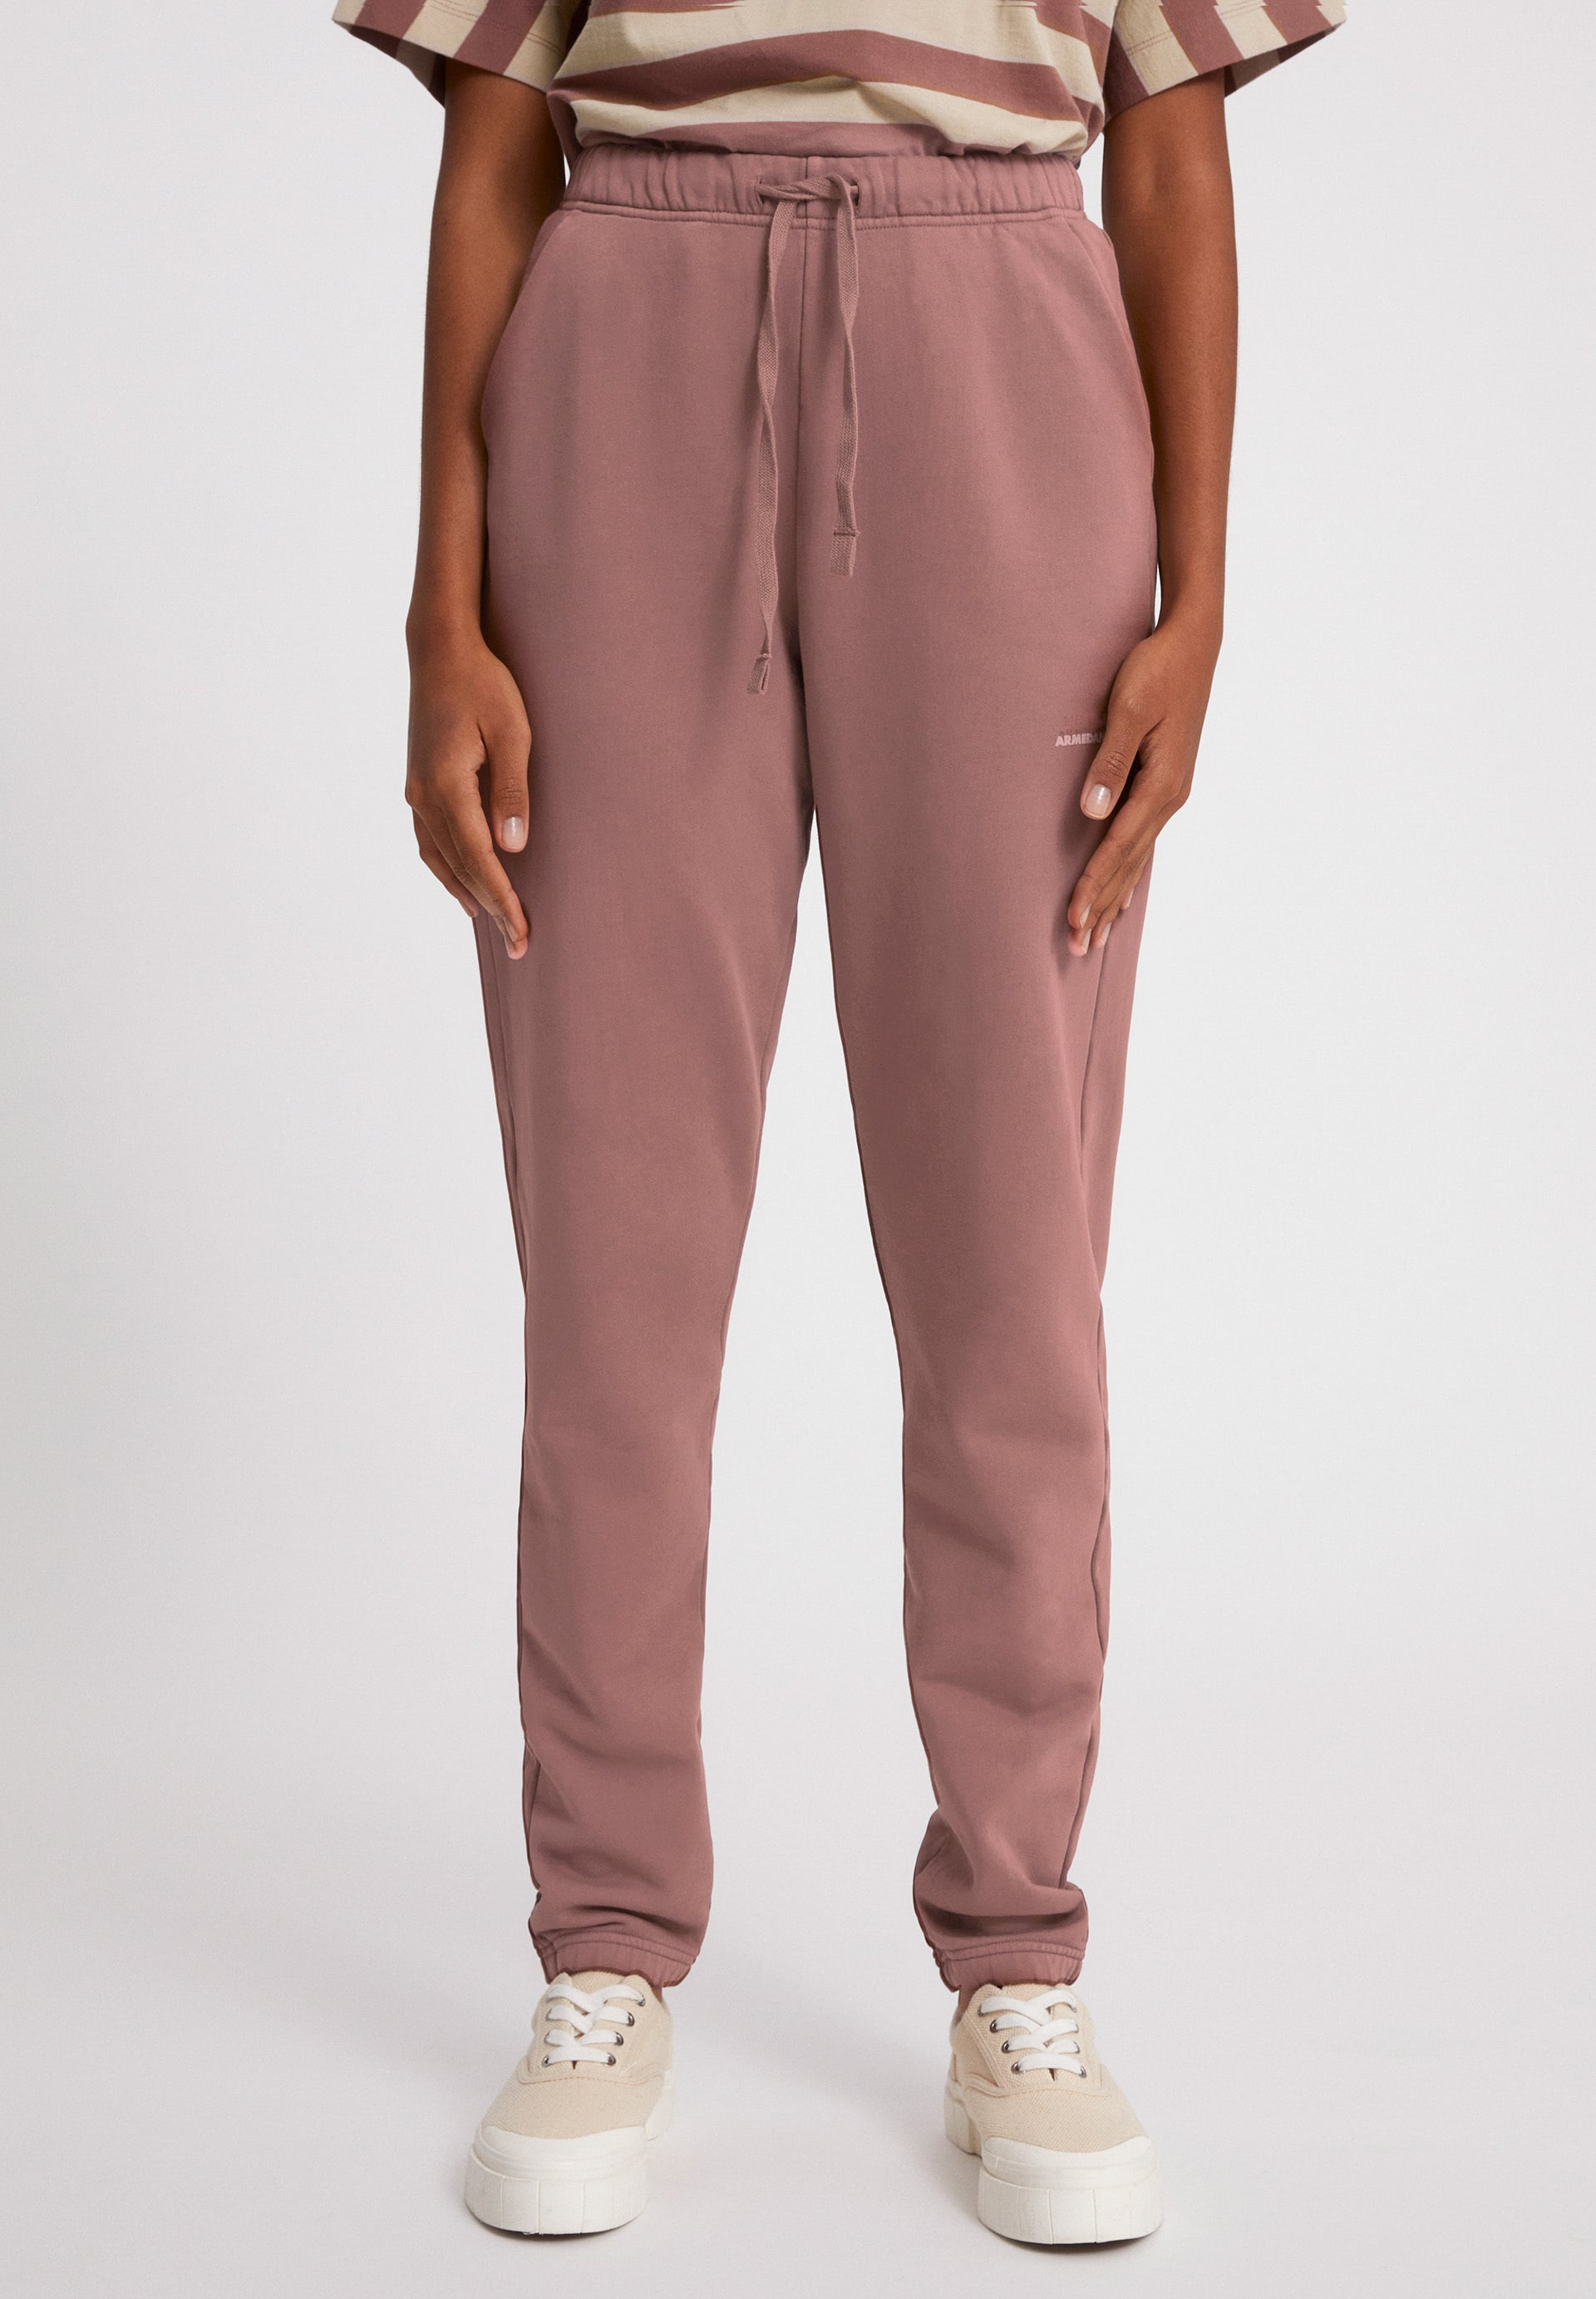 IVAA EARTHCOLORS® Sweat Pants made of Organic Cotton